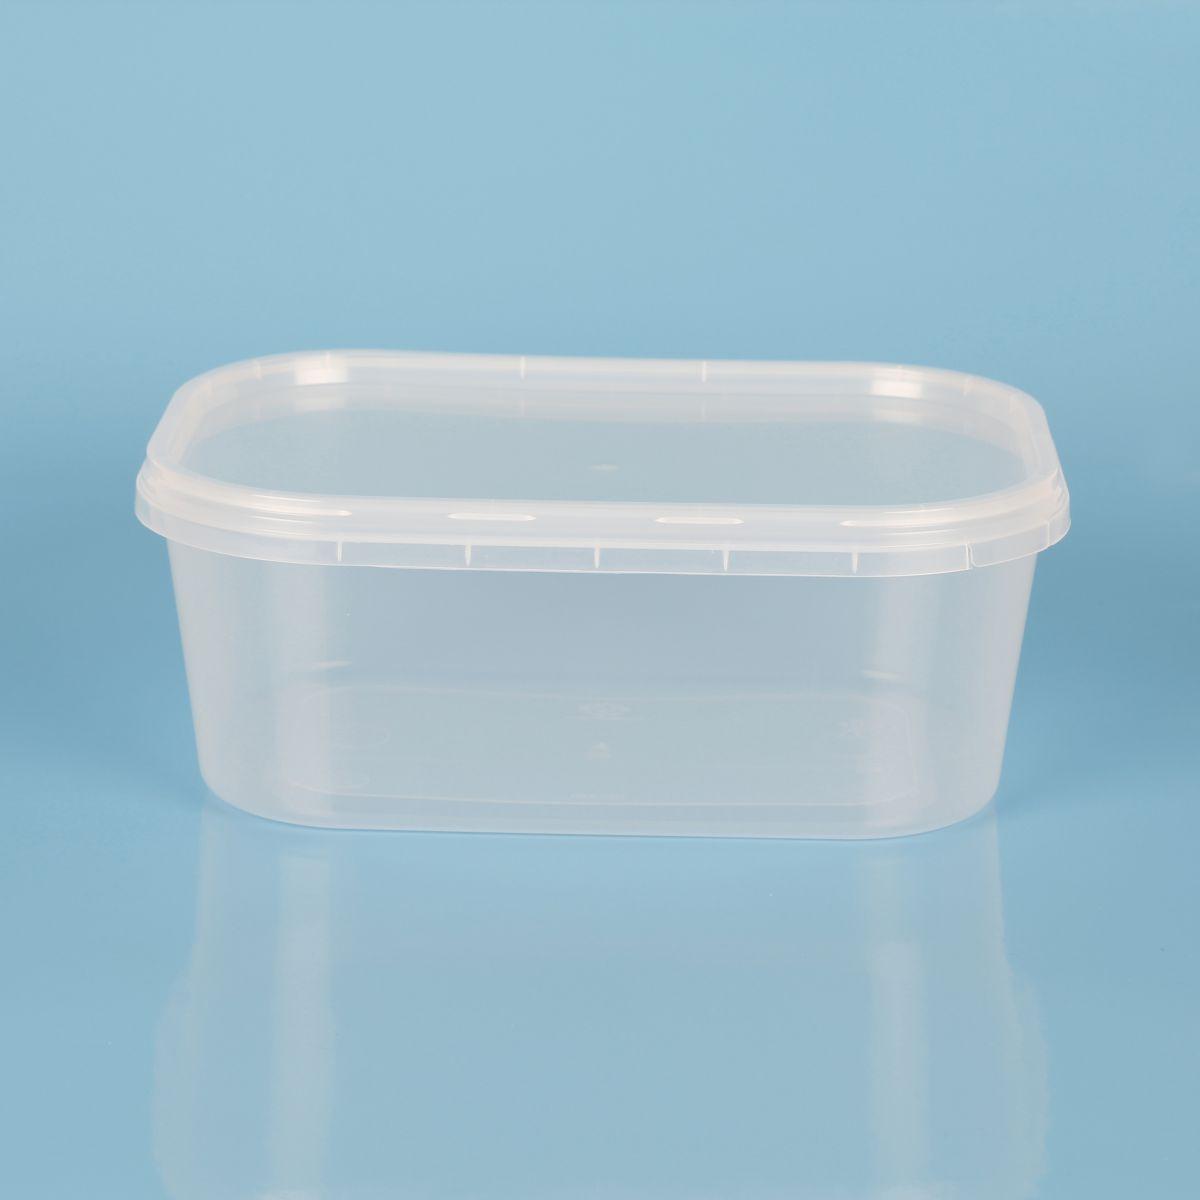 Vaschetta per gelato in plastica con sigillo – Codice Resaplast 014001